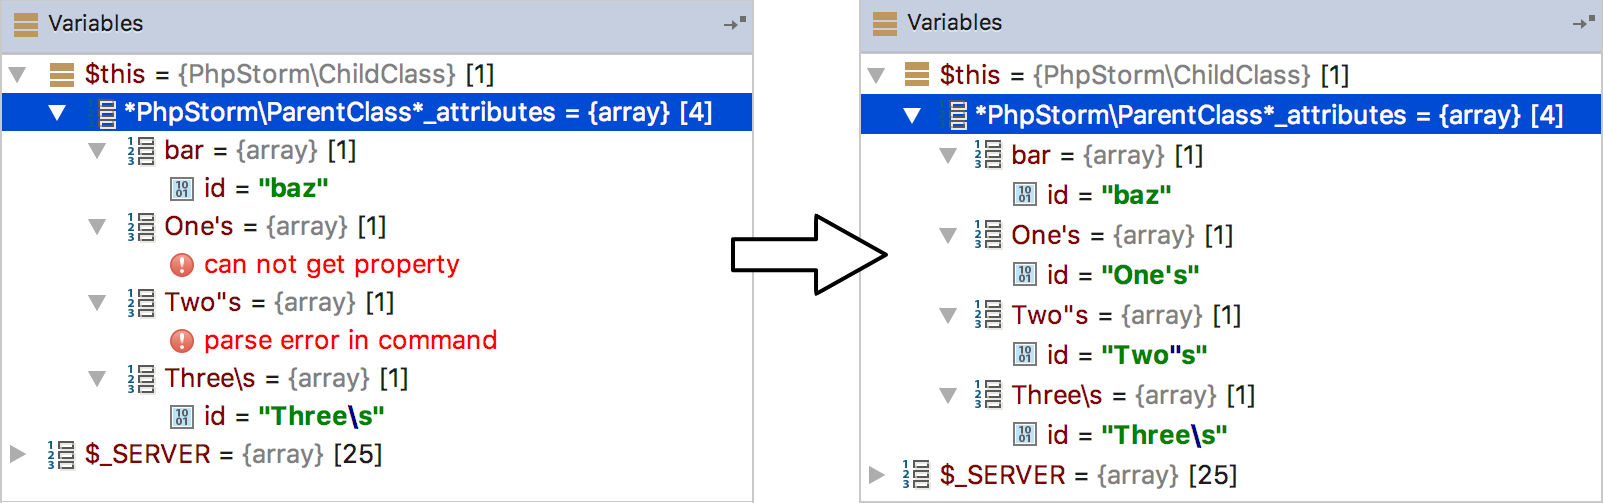 properties_parse